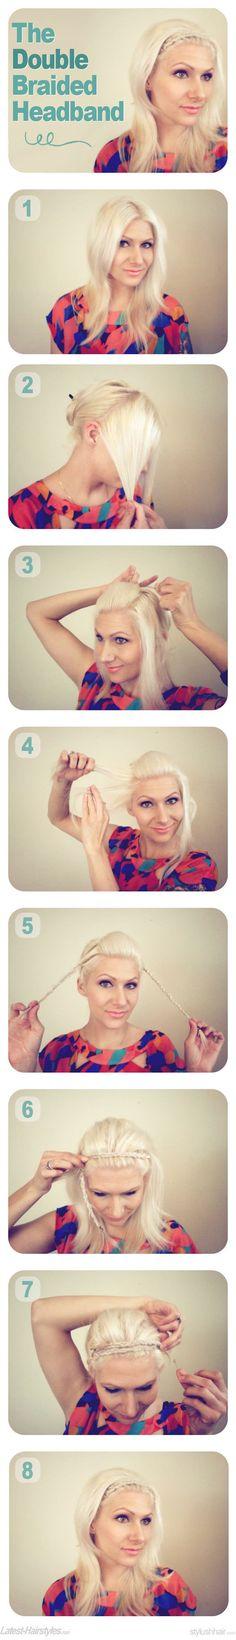 Double braided headband tutorial-- wish my hair was long enough! Braid Headband Tutorial, Braid Hairband, Braided Headbands, Braided Scarf, Scarf Tutorial, Flower Tutorial, Tips Belleza, Pretty Hairstyles, Headband Hairstyles